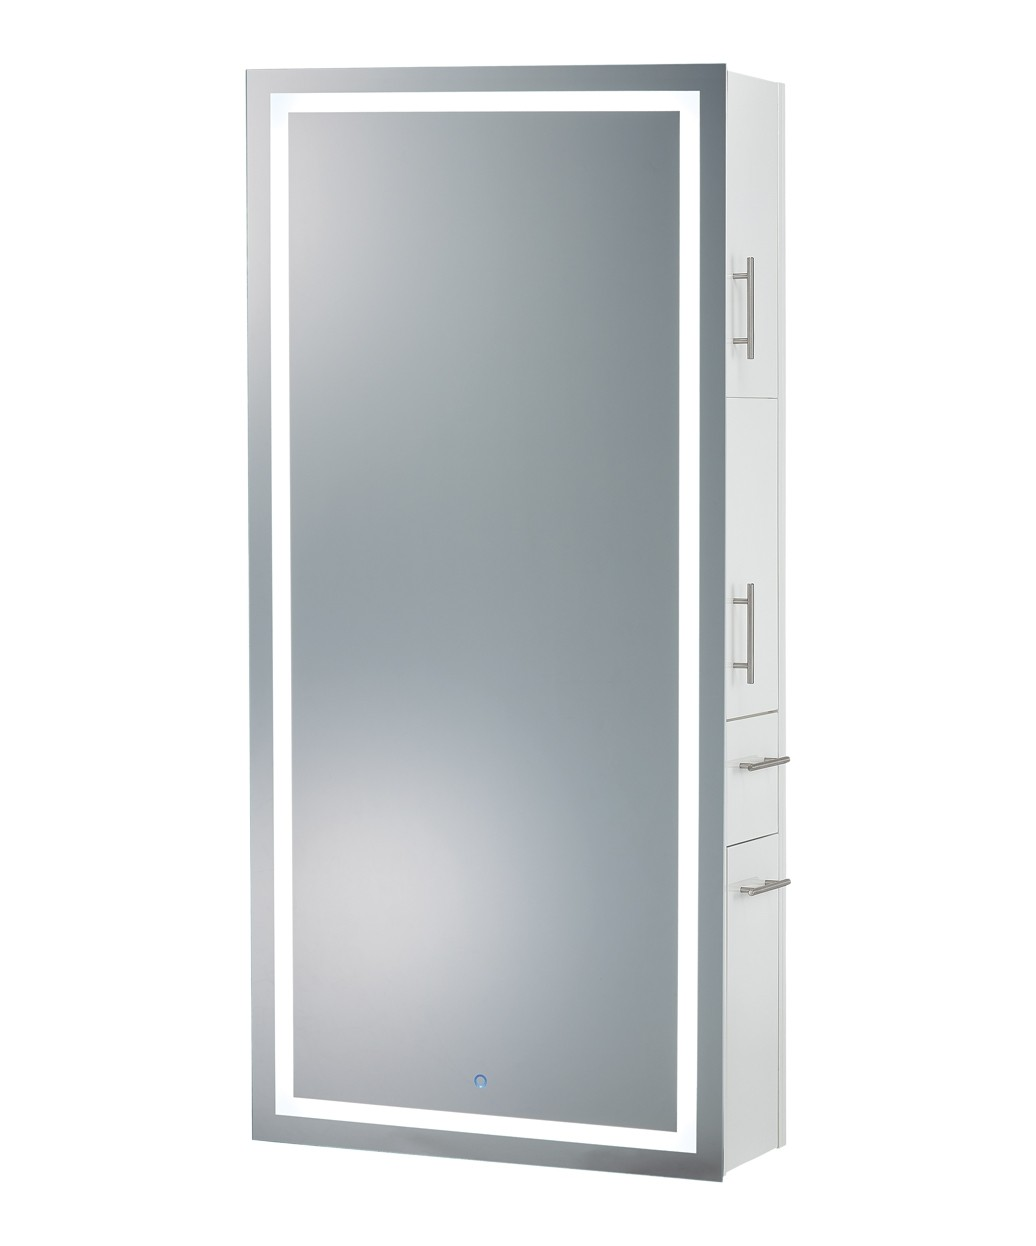 Pibbs Lumina LED Salon Mirror & Storage Server